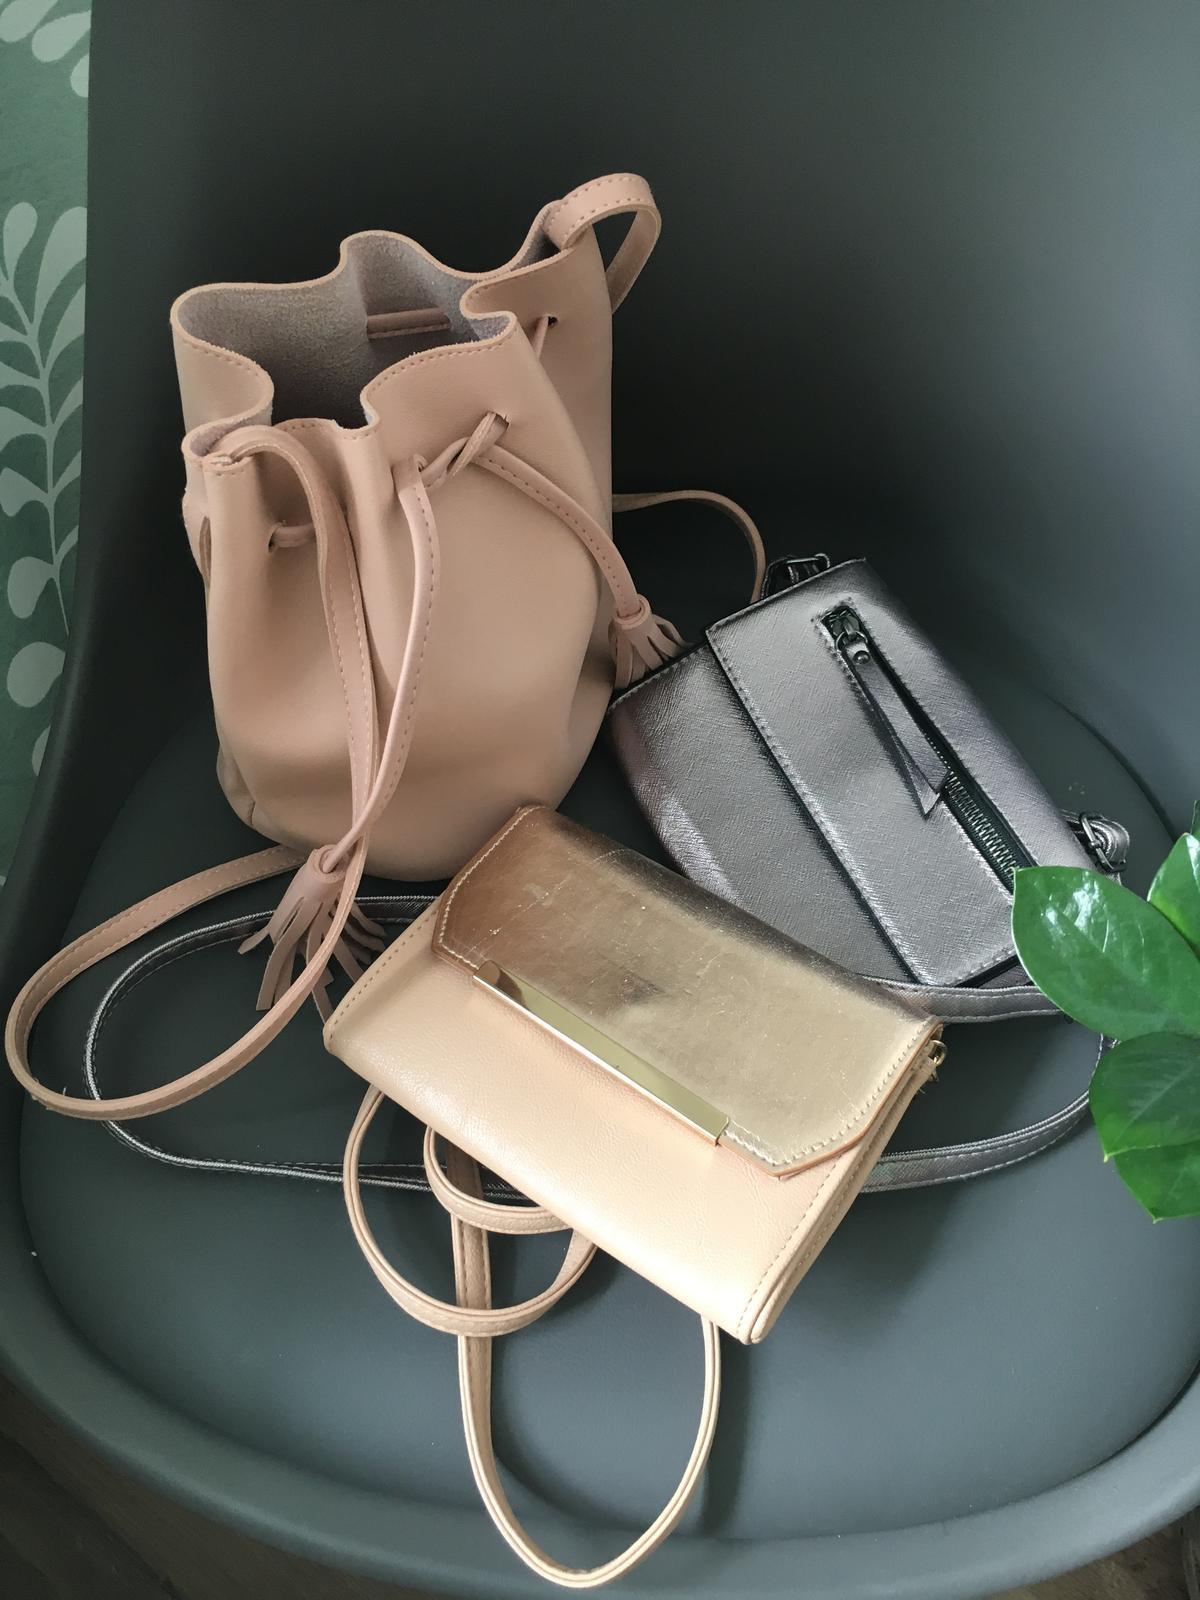 Menšie kabelky - Obrázok č. 1